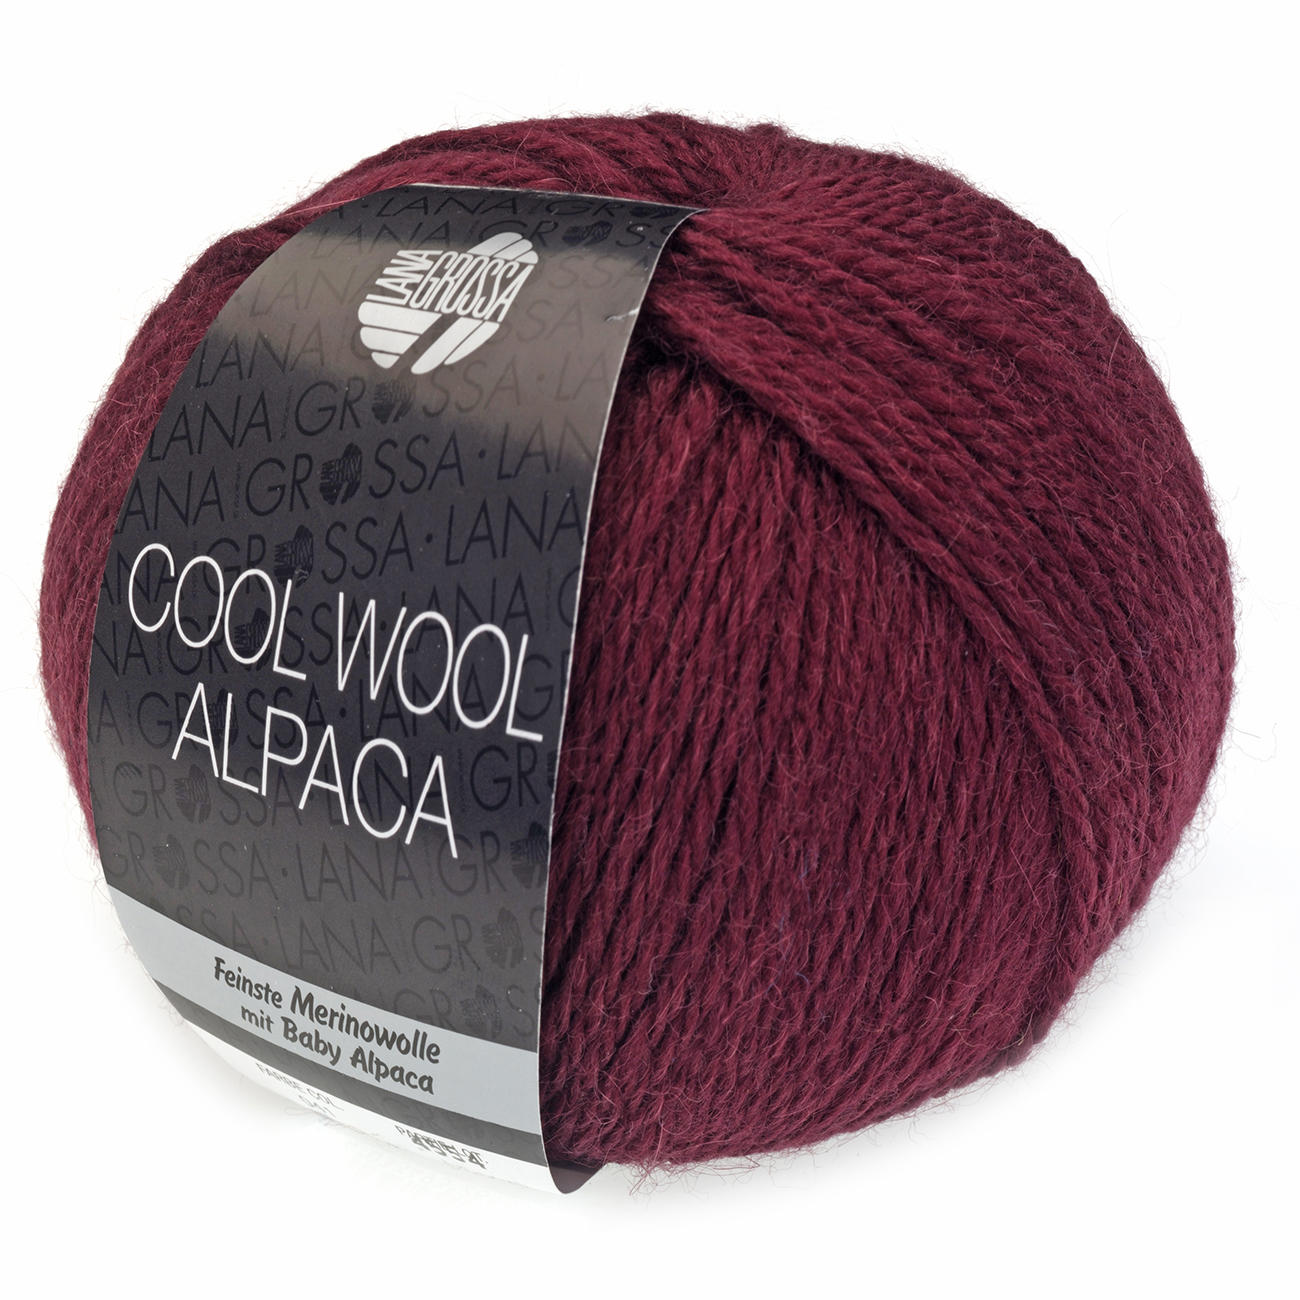 Lana Grossa Charity Paket Wolle Kreativ Schal des Lebens 2018